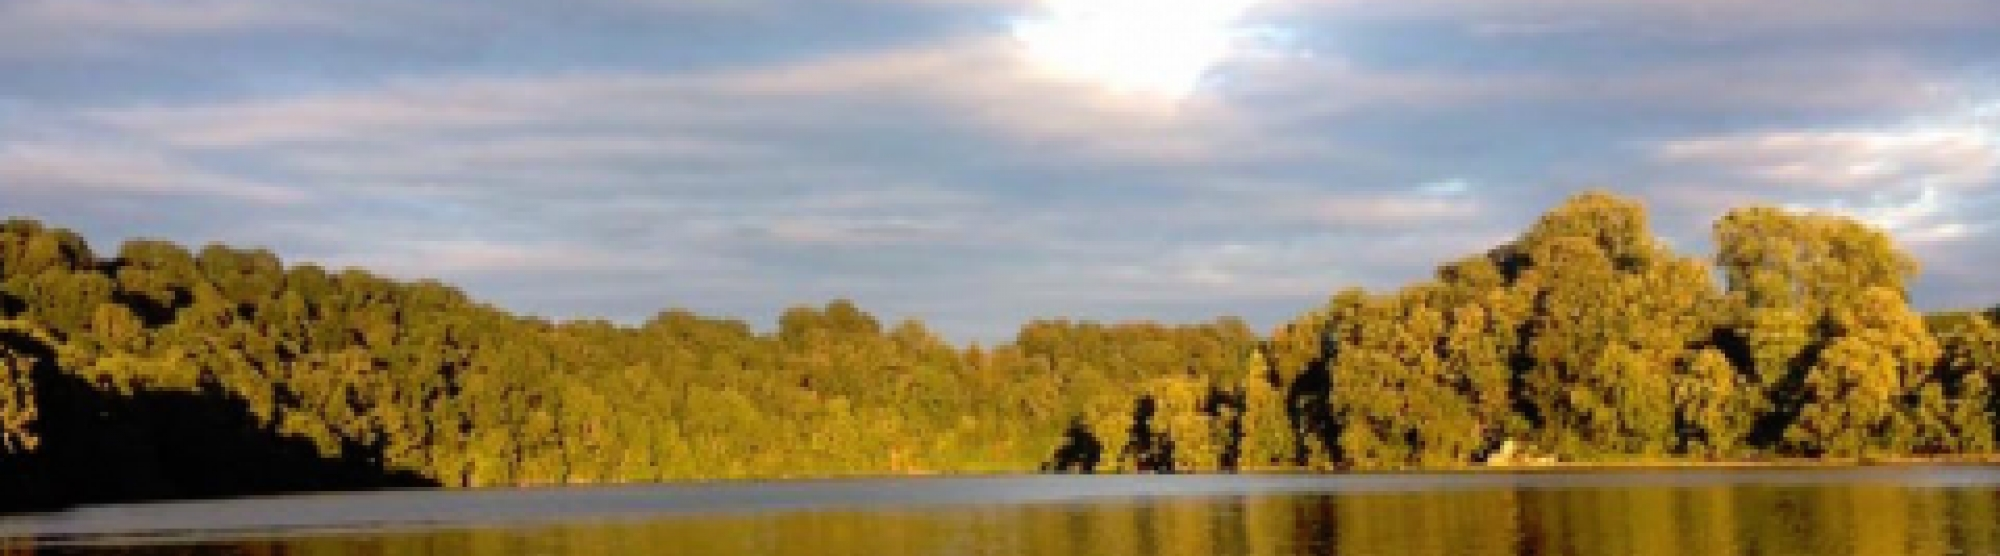 River Dart landscape with canoe adventures